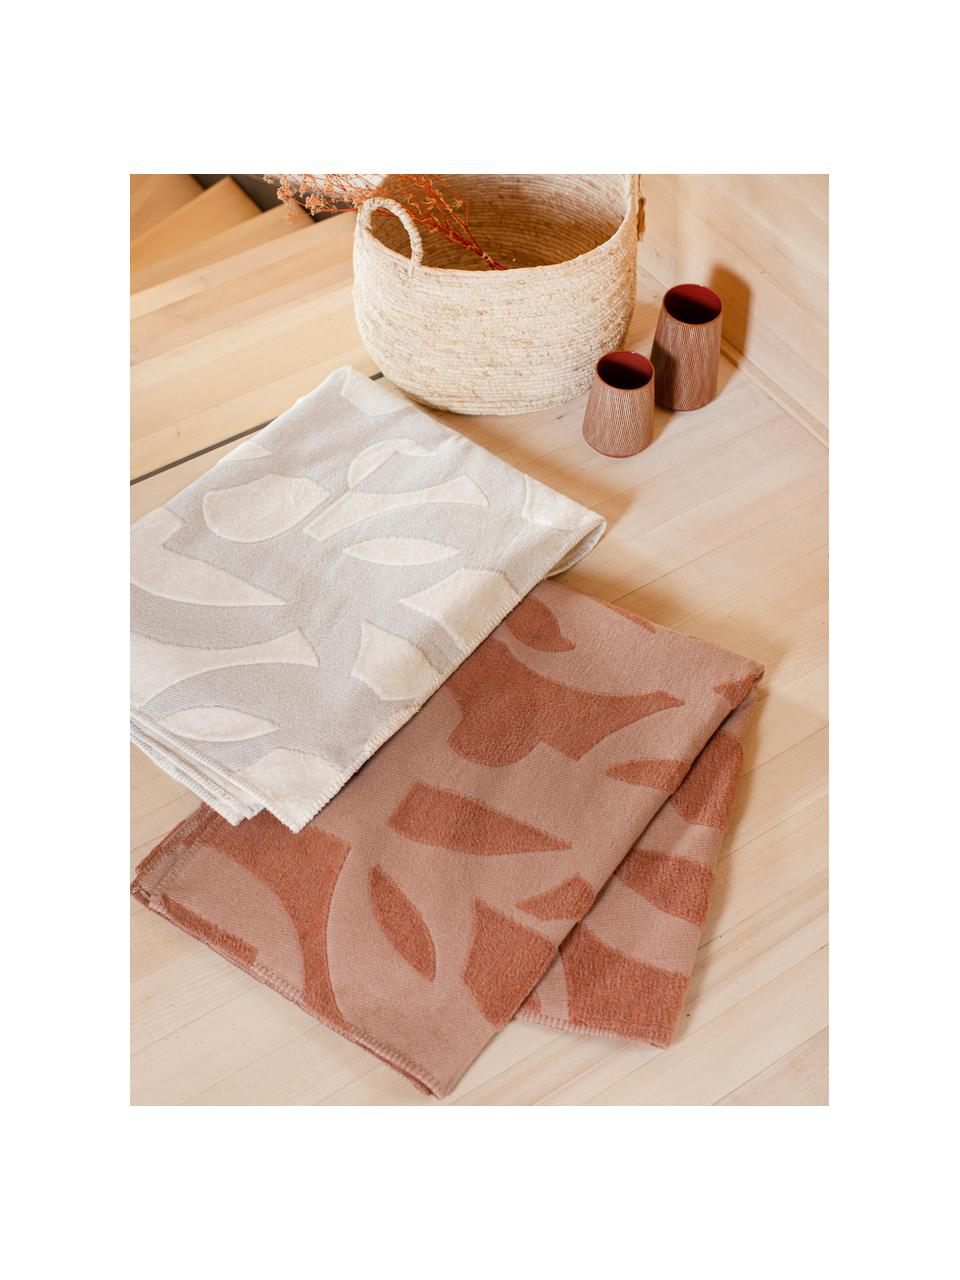 Bavlnená deka s prešívaním Grafic, Bledoružová, tehlová